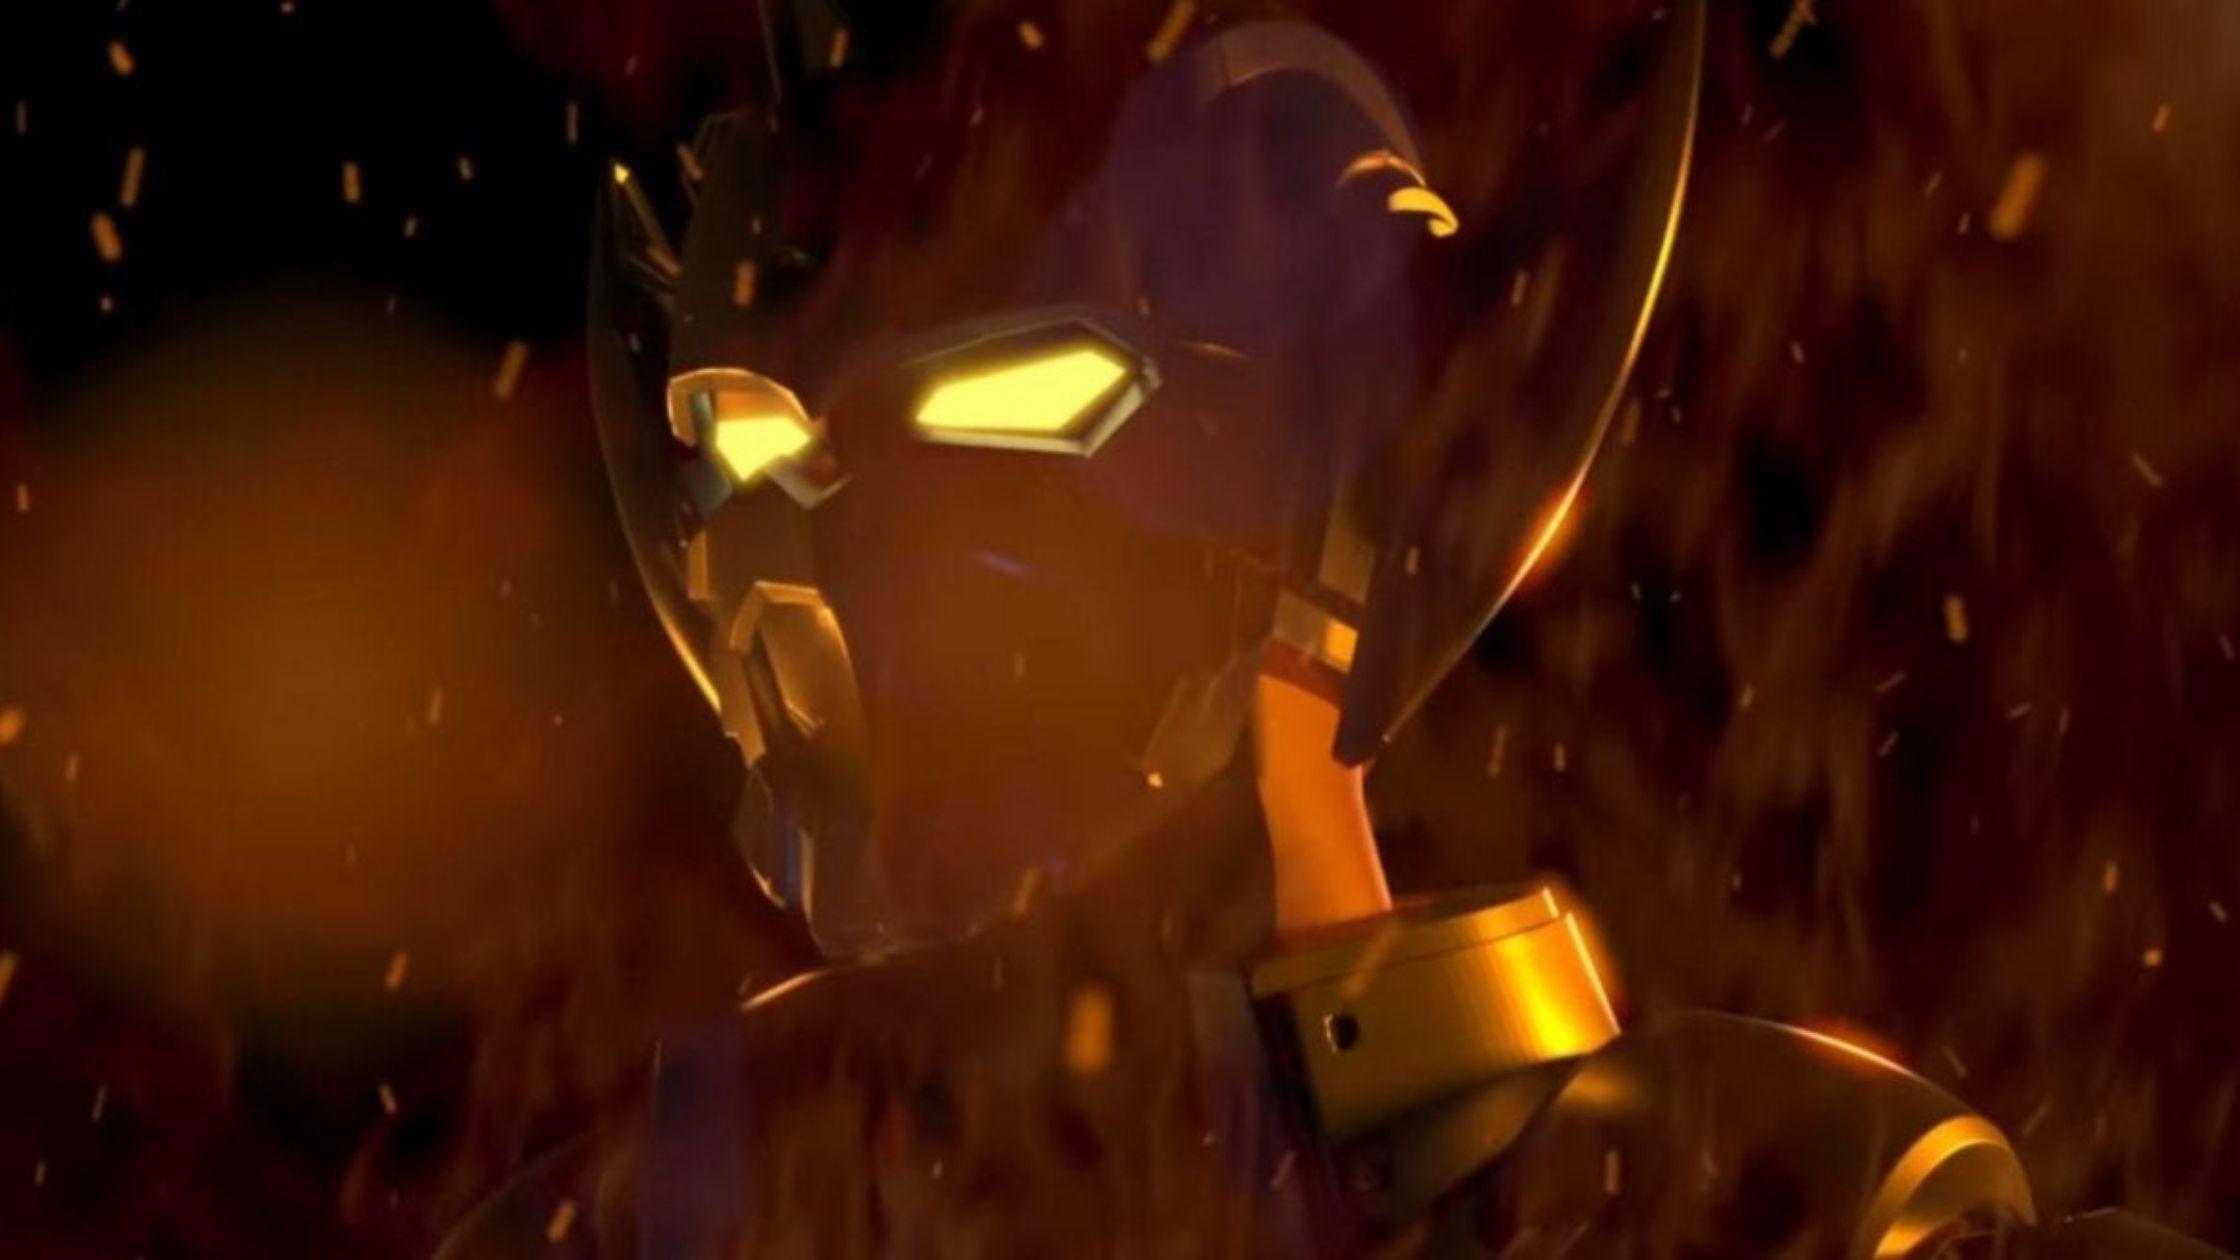 When Is 'Ultraman' Season 2 Coming To Netflix?